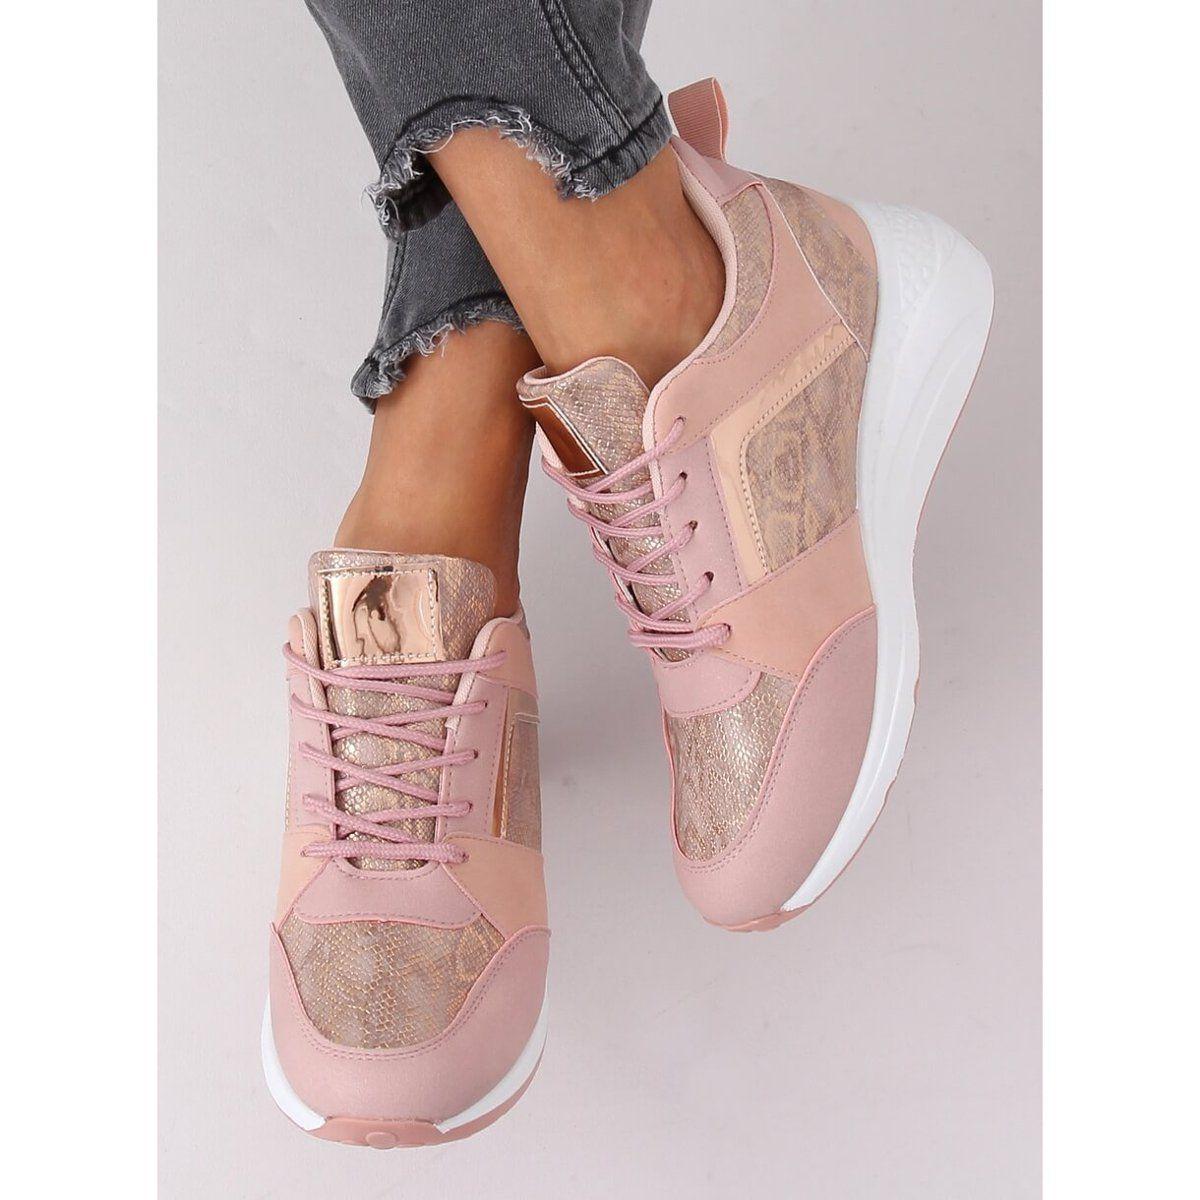 Sneakersy Na Koturnie Rozowe Yl 33 Champagne Puma Fierce Sneaker High Top Sneakers Sneakers